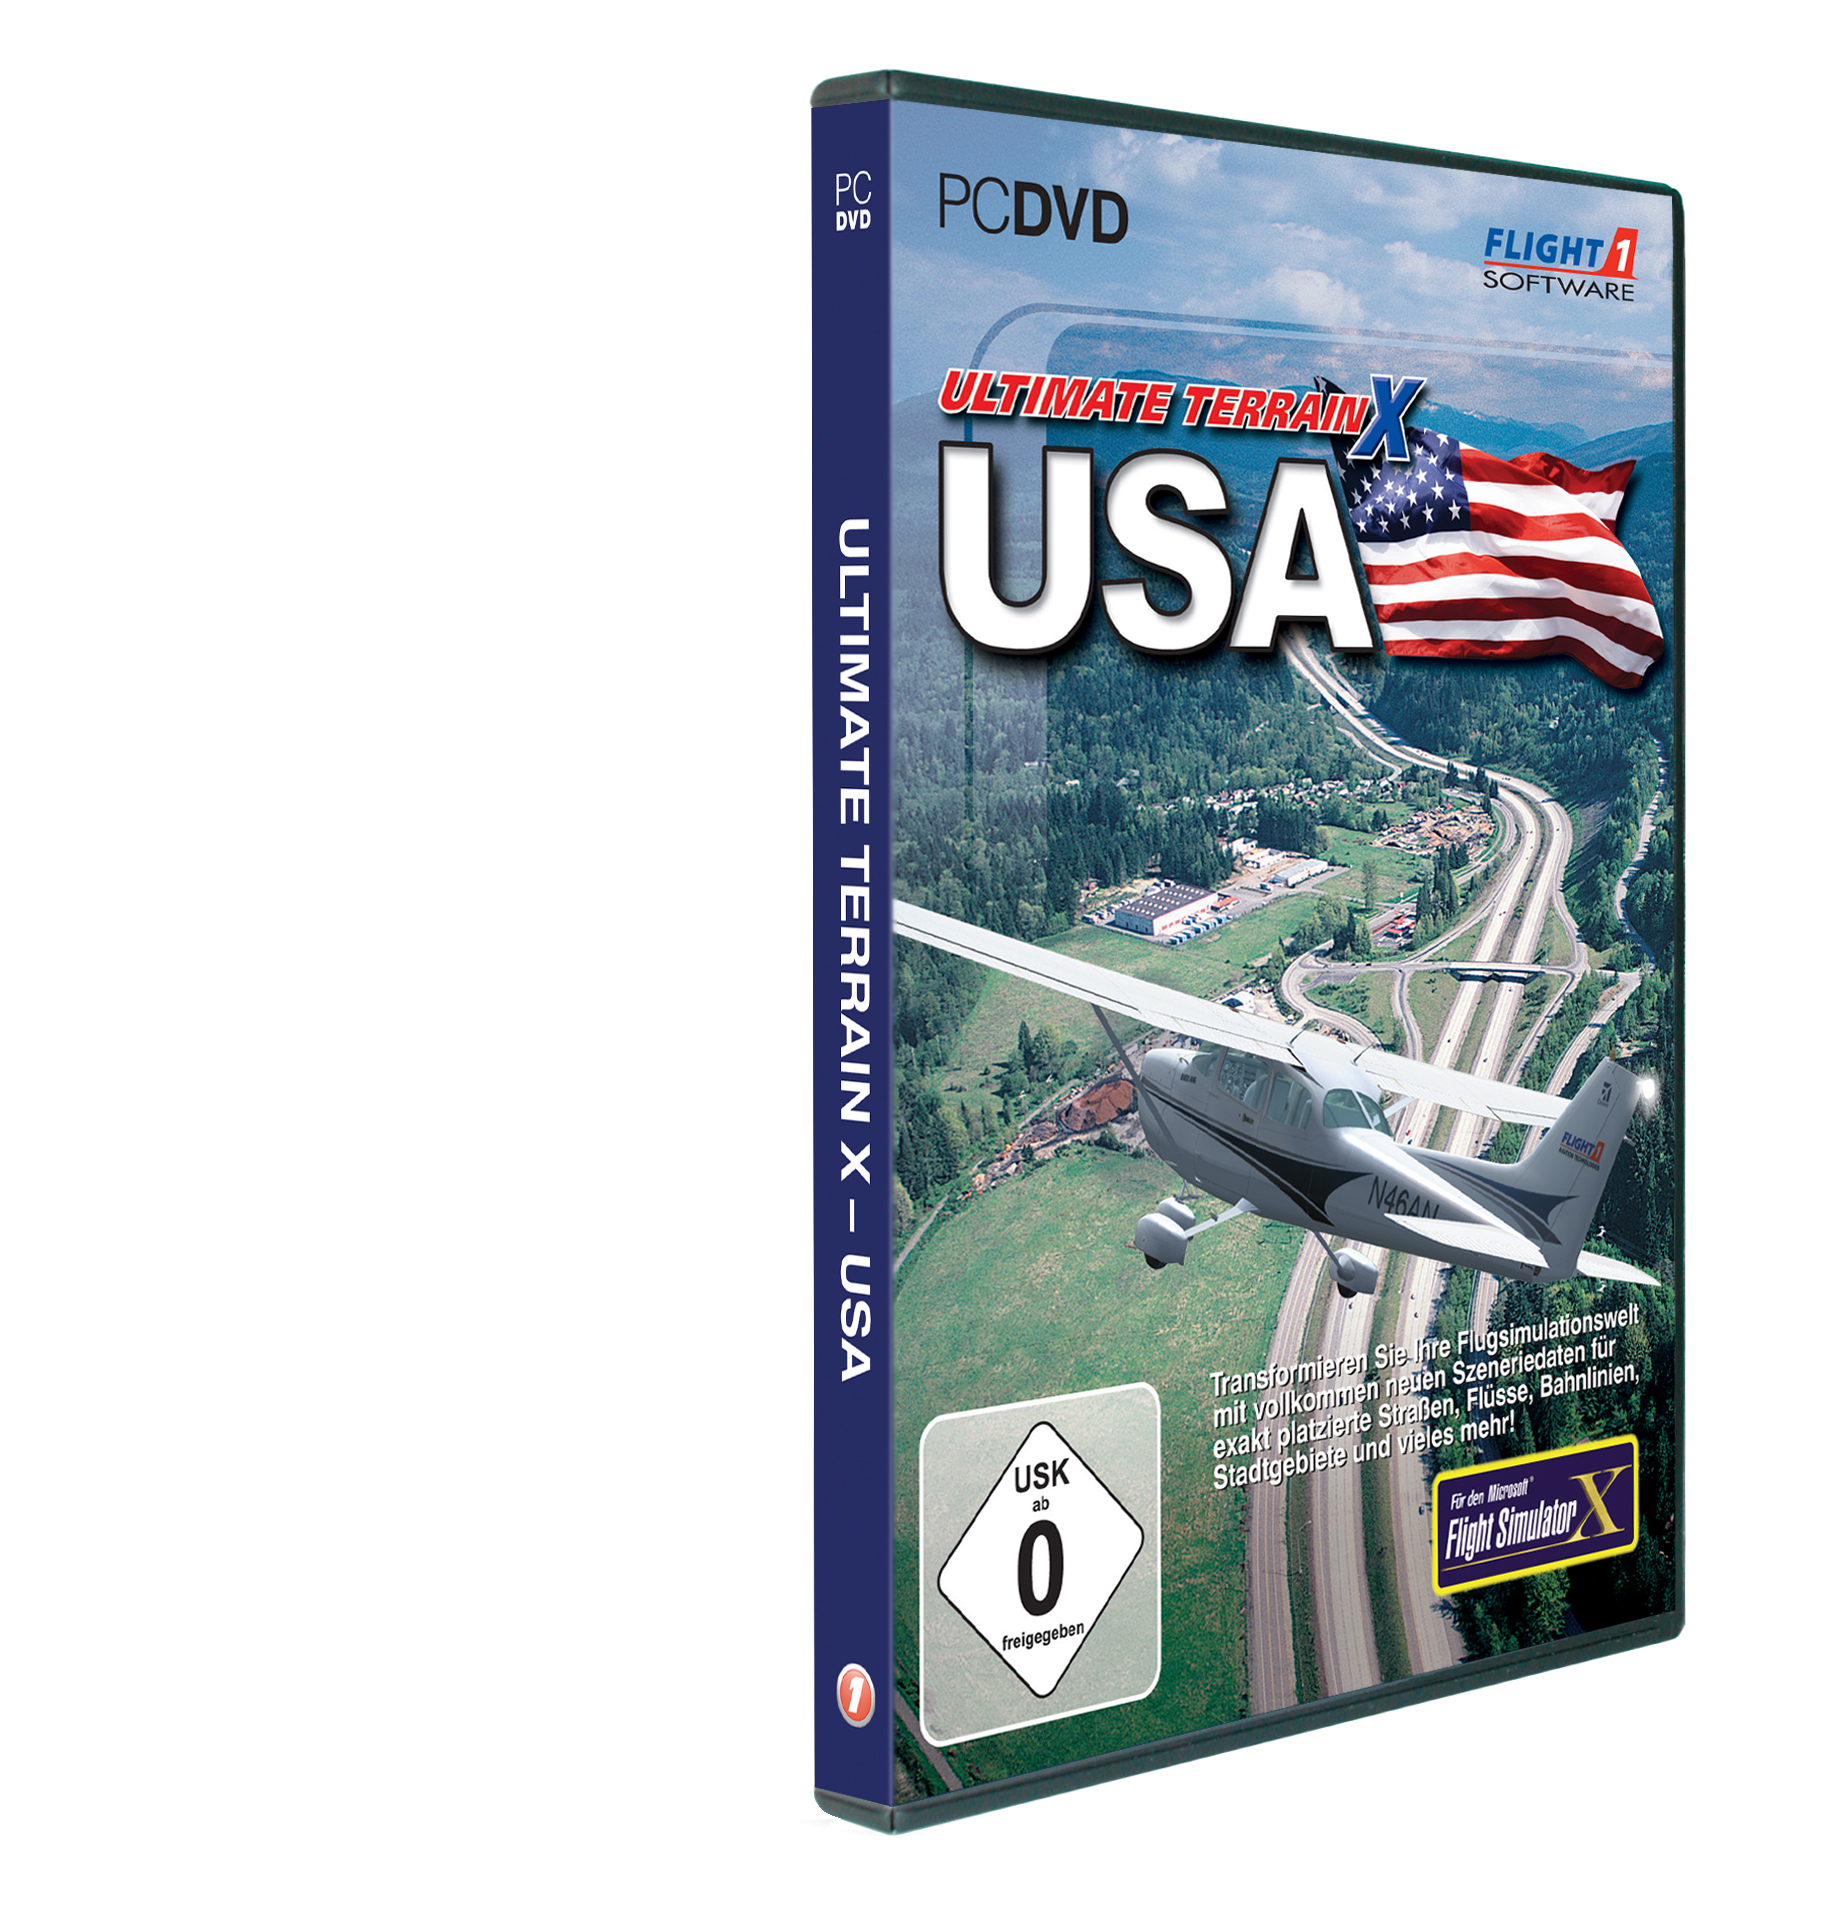 Ultimate Terrain X - USA | Aerosoft Shop